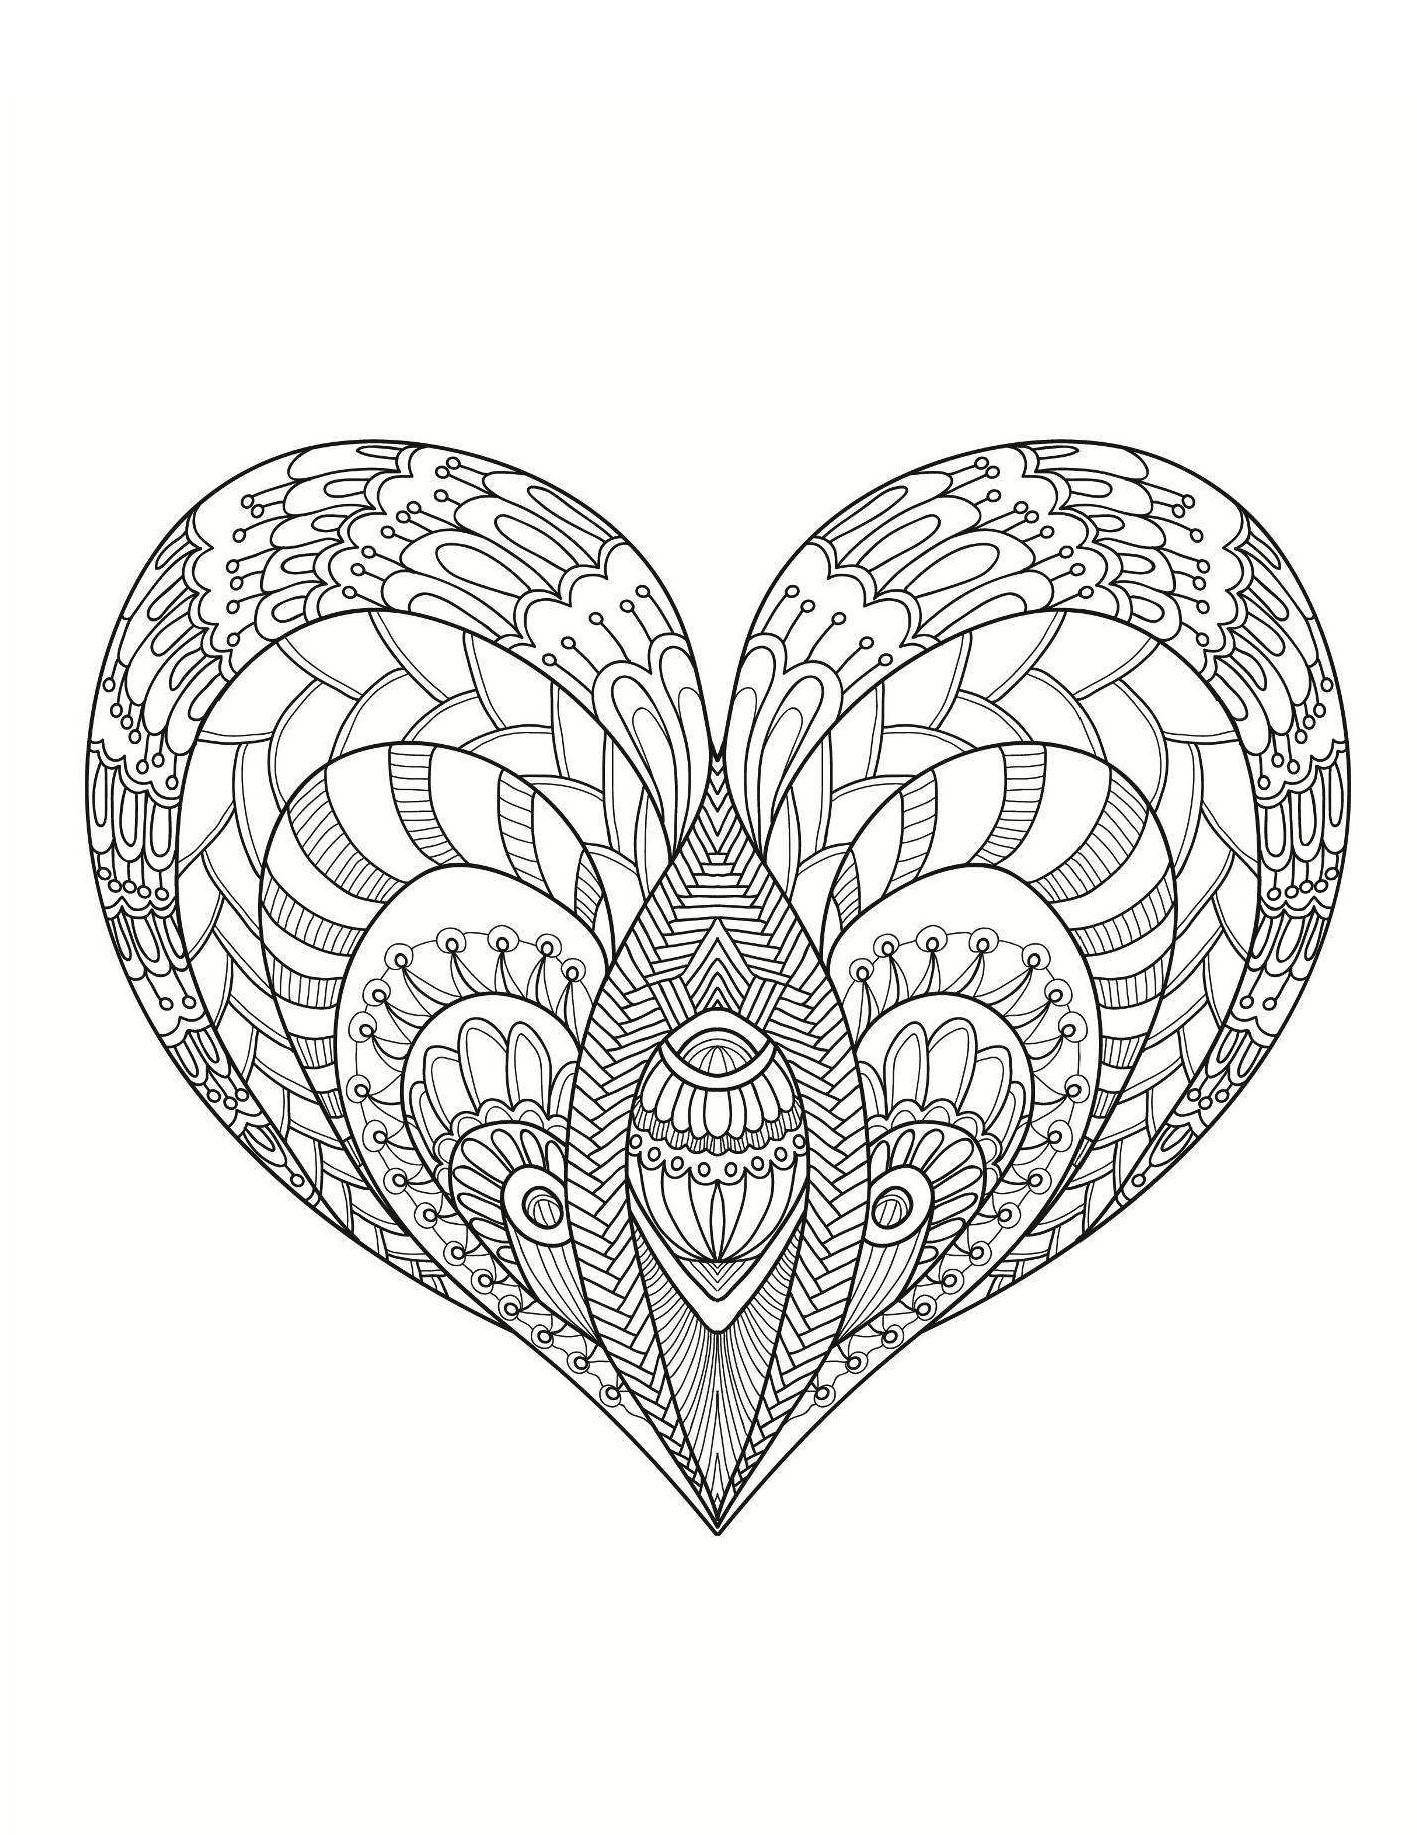 сердечко с мелким рисунком сердца раскраски антистресс